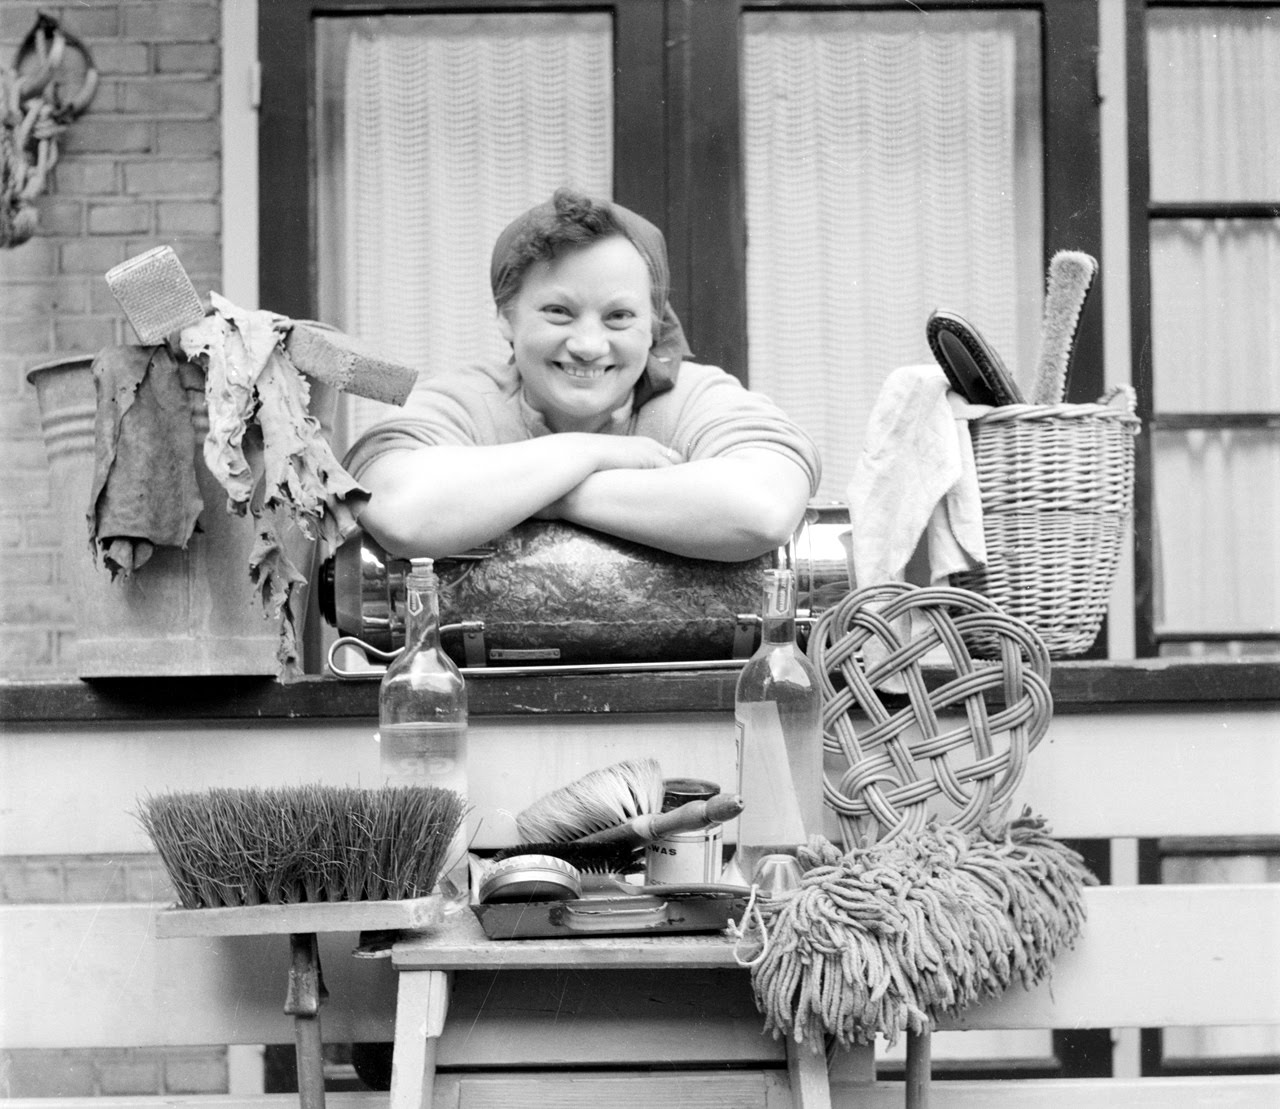 Bint Photobooks On Internet Dutch Housekeeping In The 50s